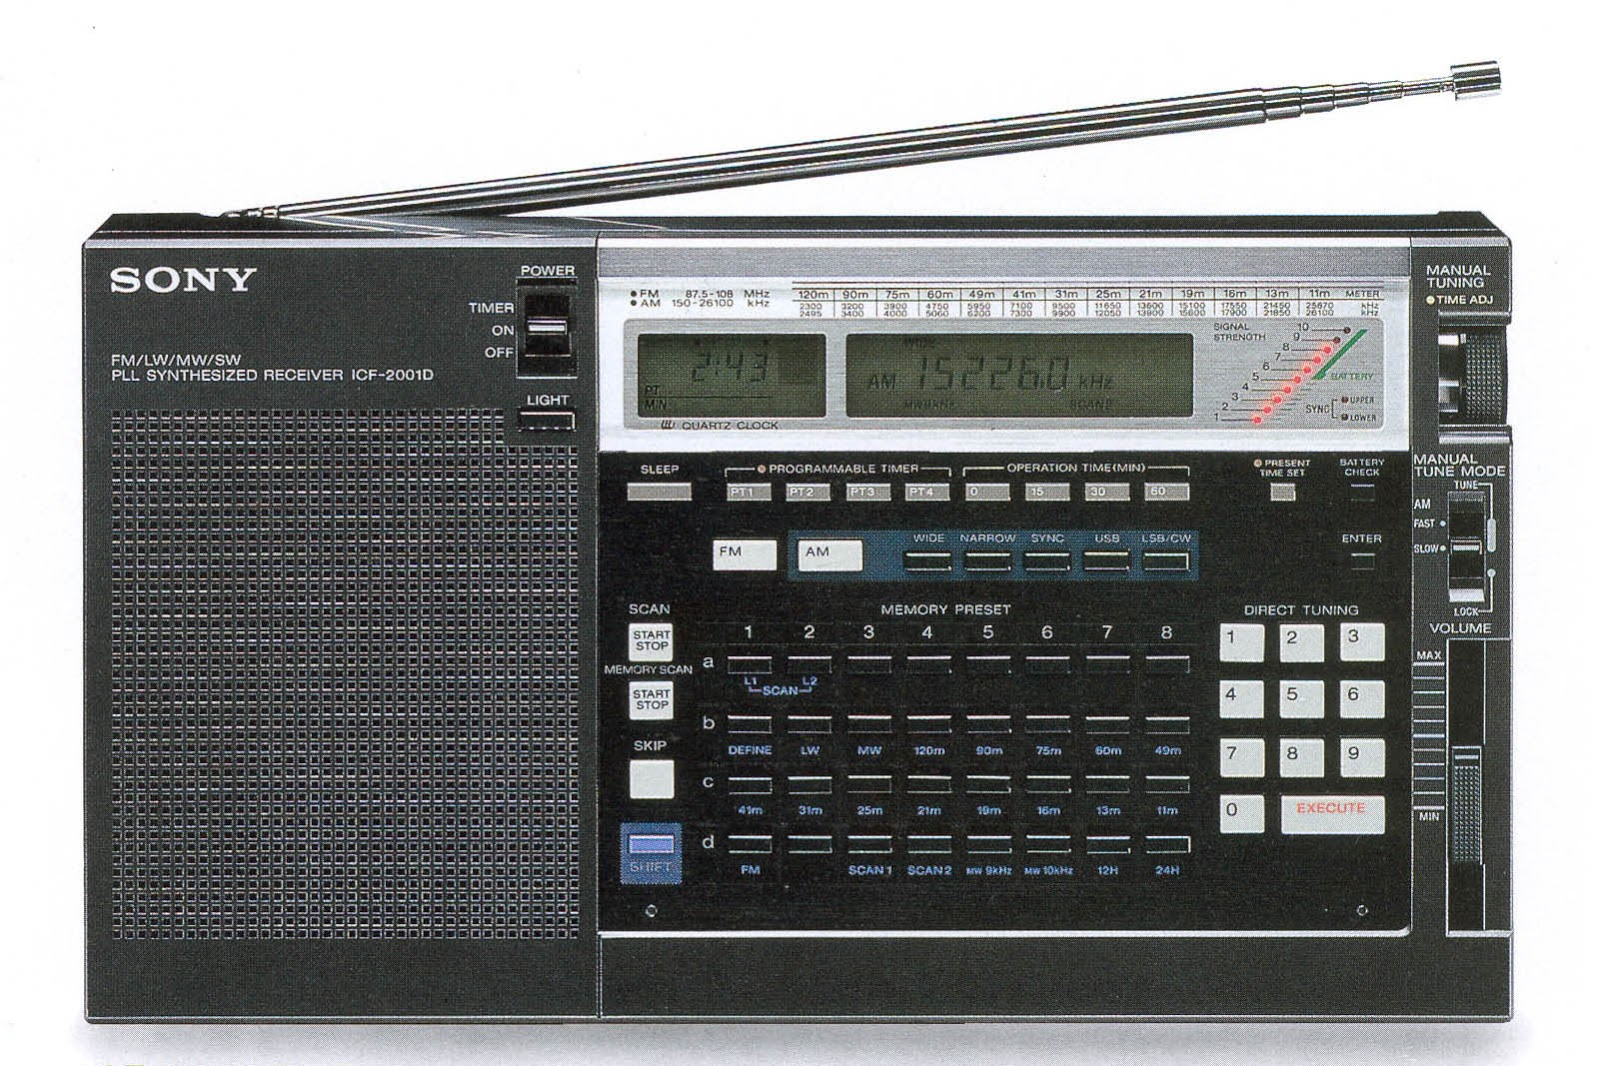 Sony Icf 2001d Repair Hifidreamer Http Wwwschematicdiagramcom Electronicdigitalclockhtml And Heres The Icf2001d Schematic Service Manual Elektrotanyacom Icf2010pdf Downloadhtml